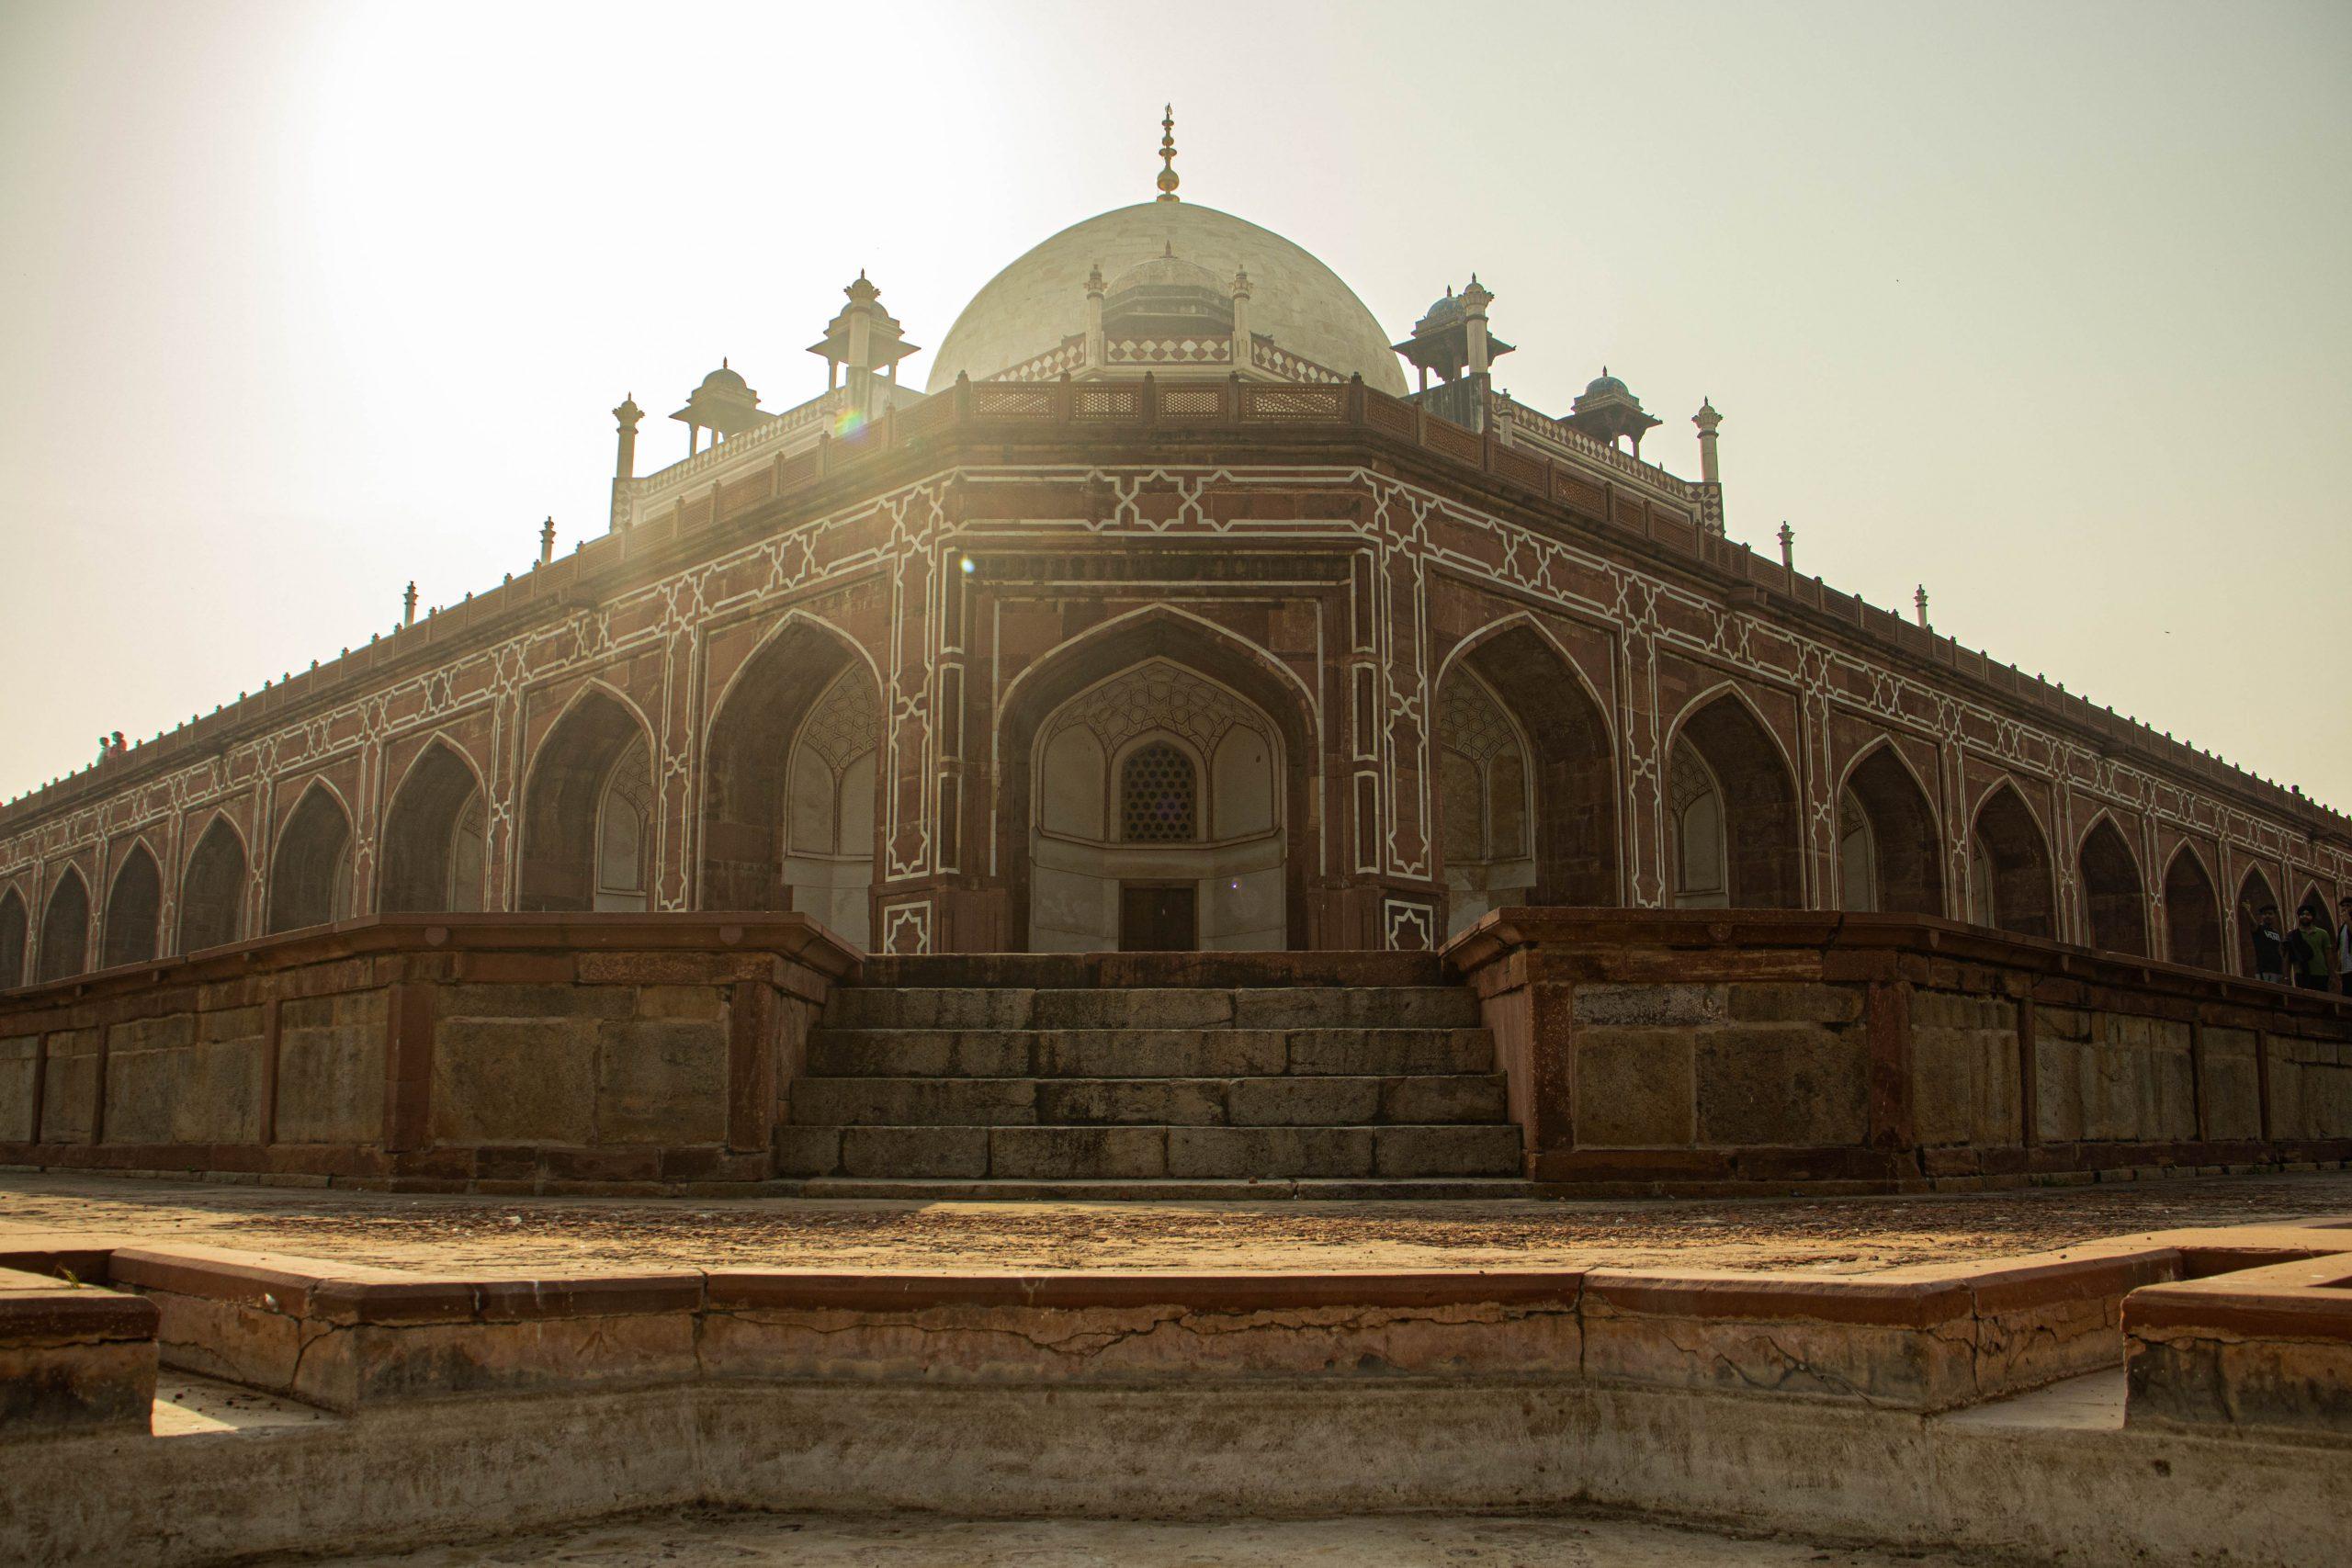 An historic building in Delhi